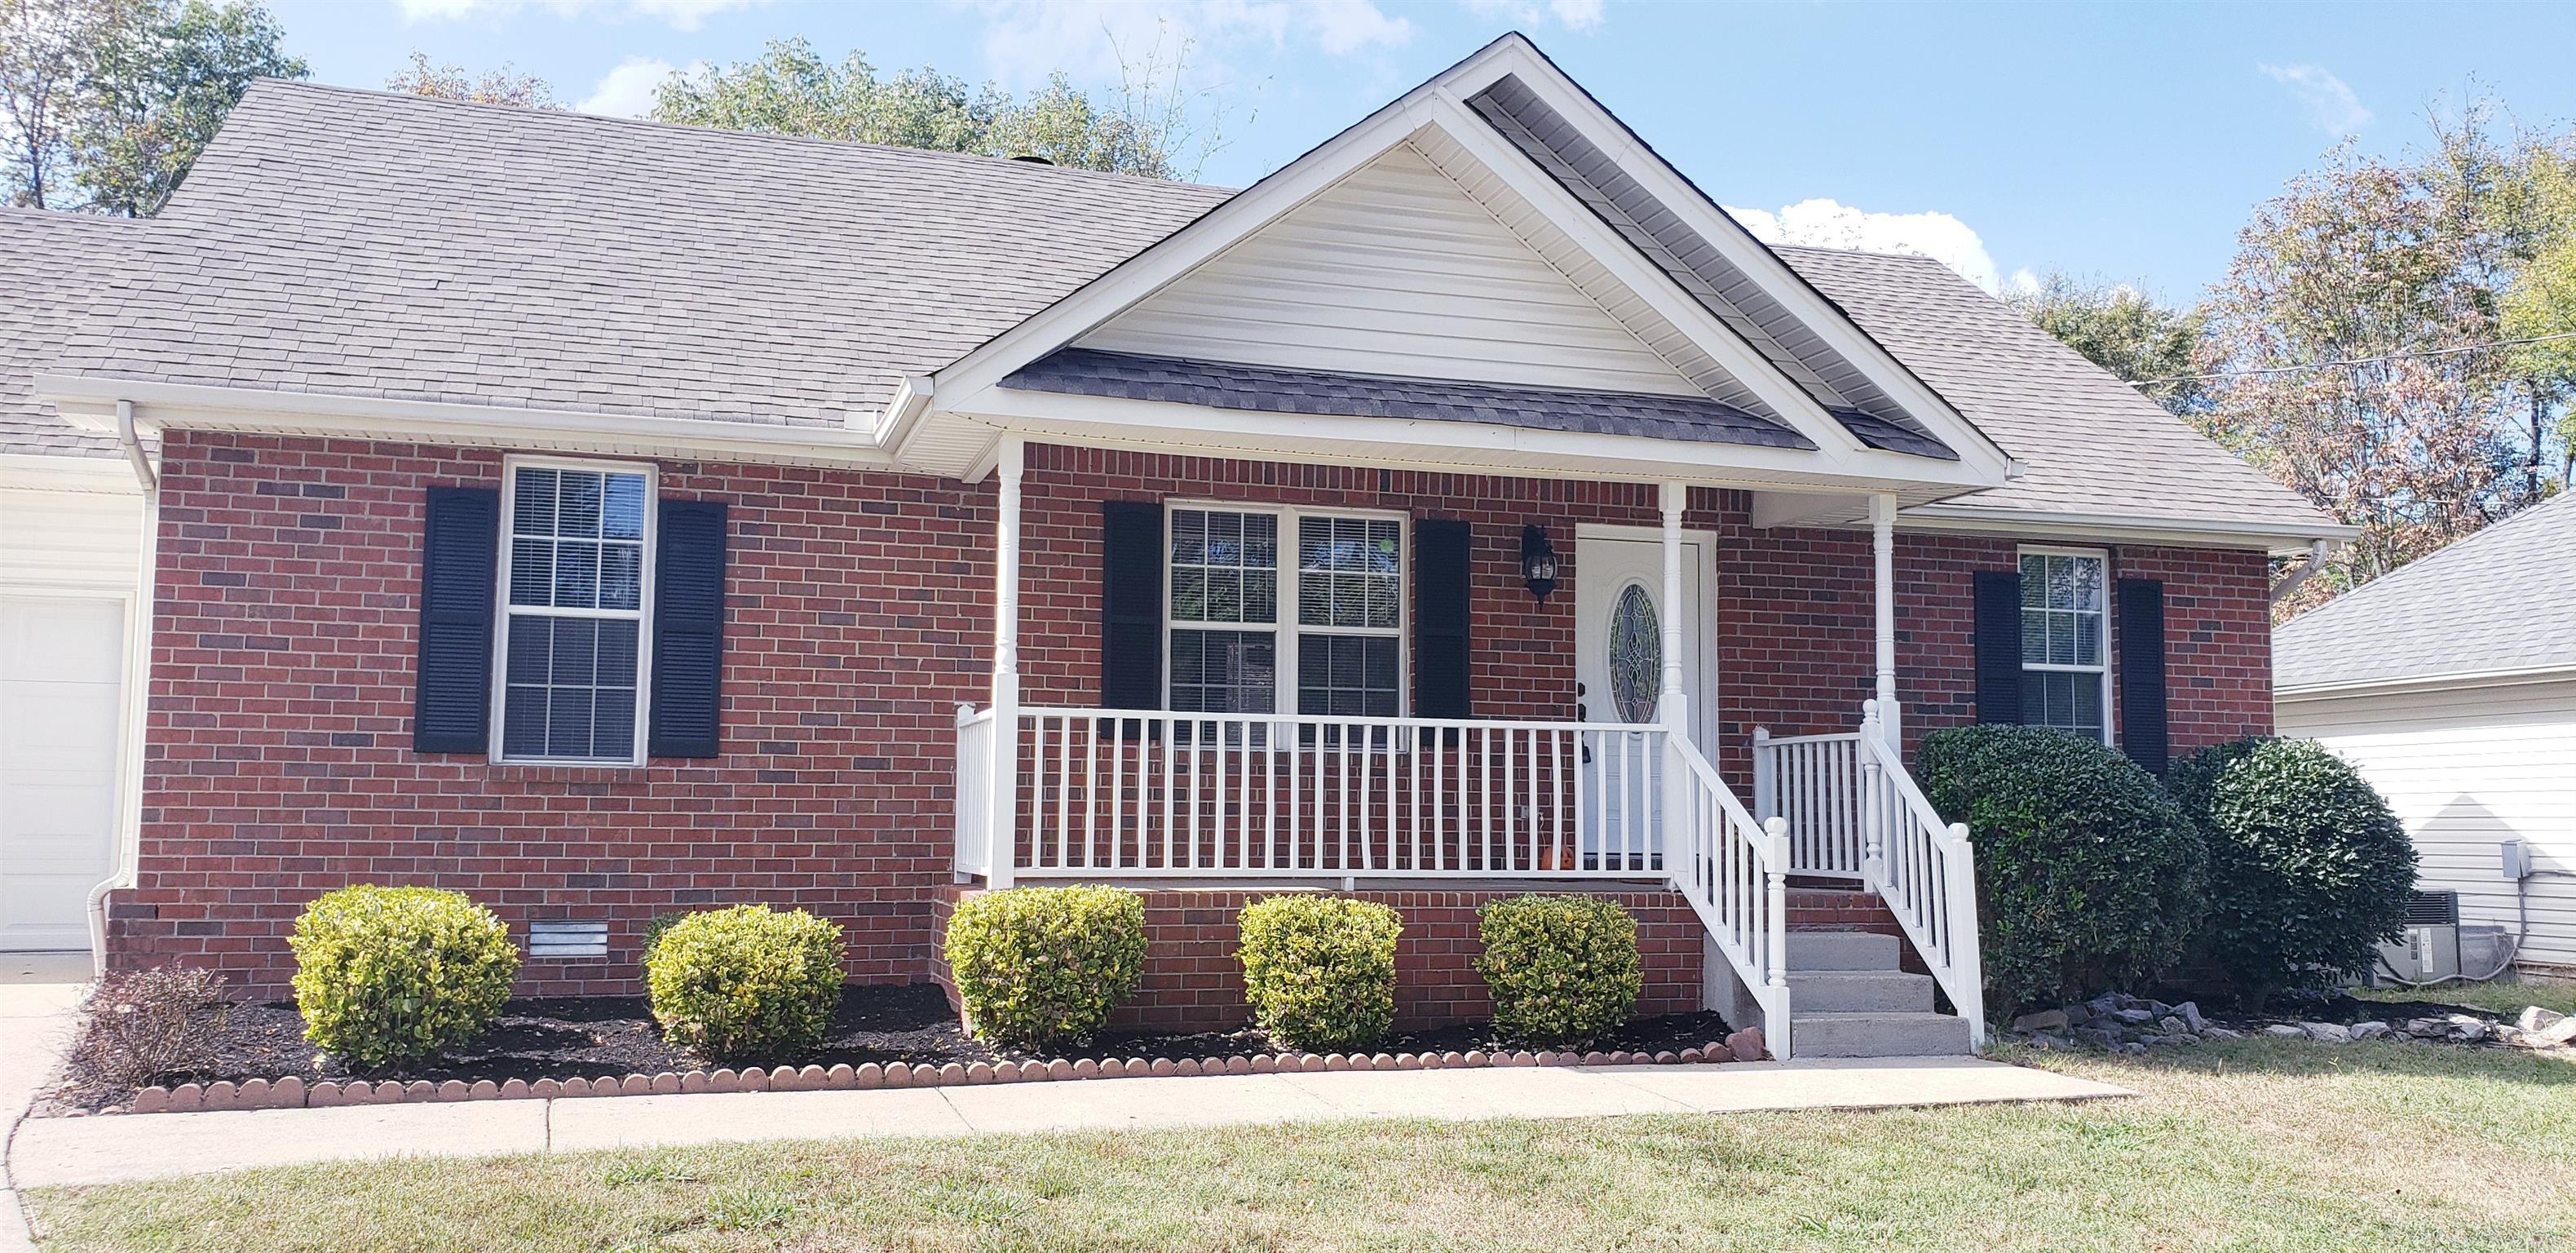 4108 Tea Garden Way, Nashville-Antioch in Davidson County County, TN 37013 Home for Sale